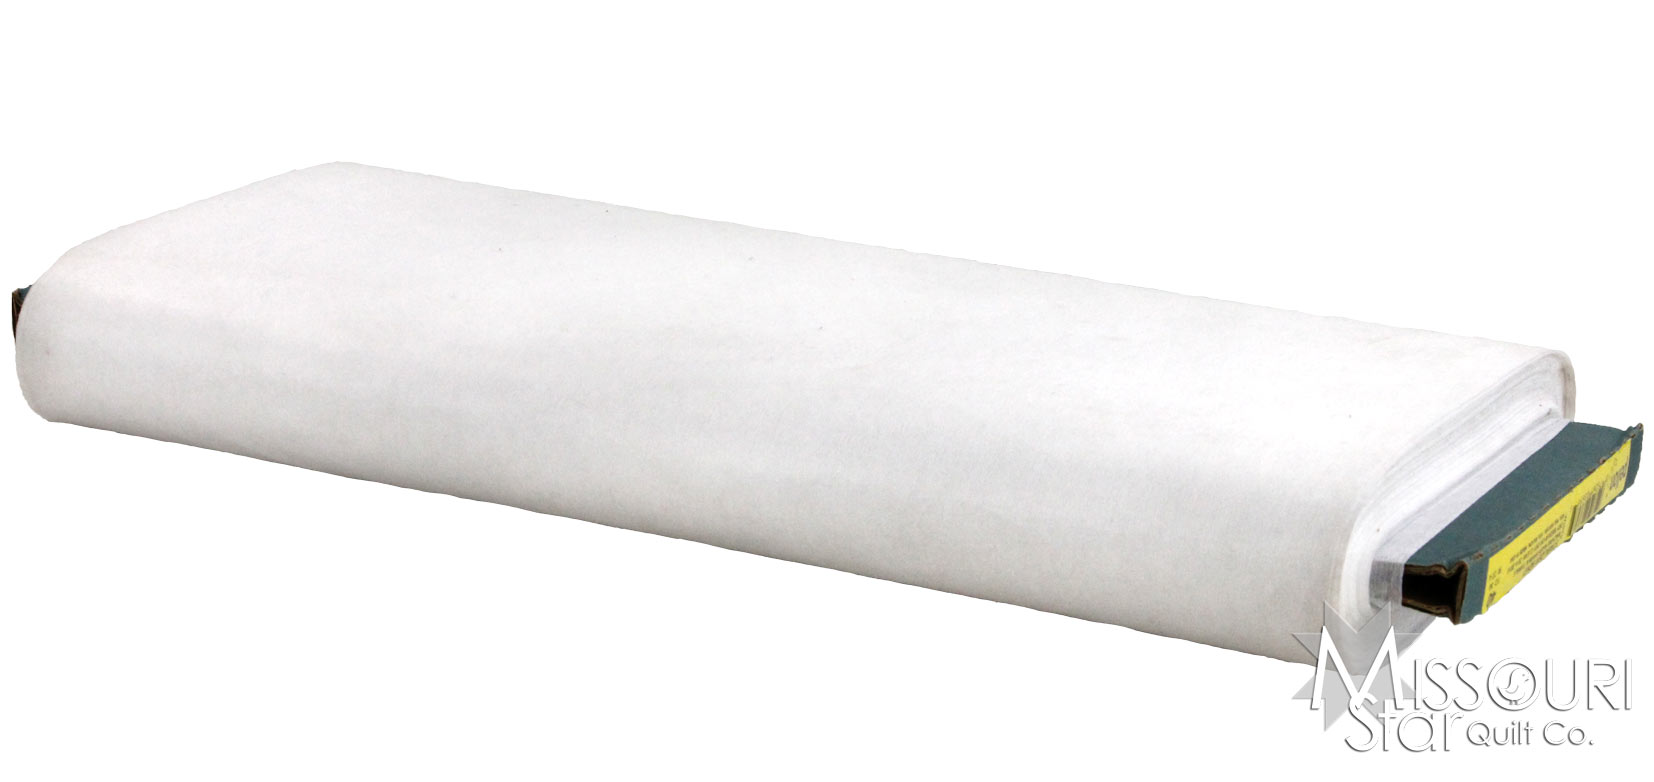 Stabilizer Midweight White Yardage